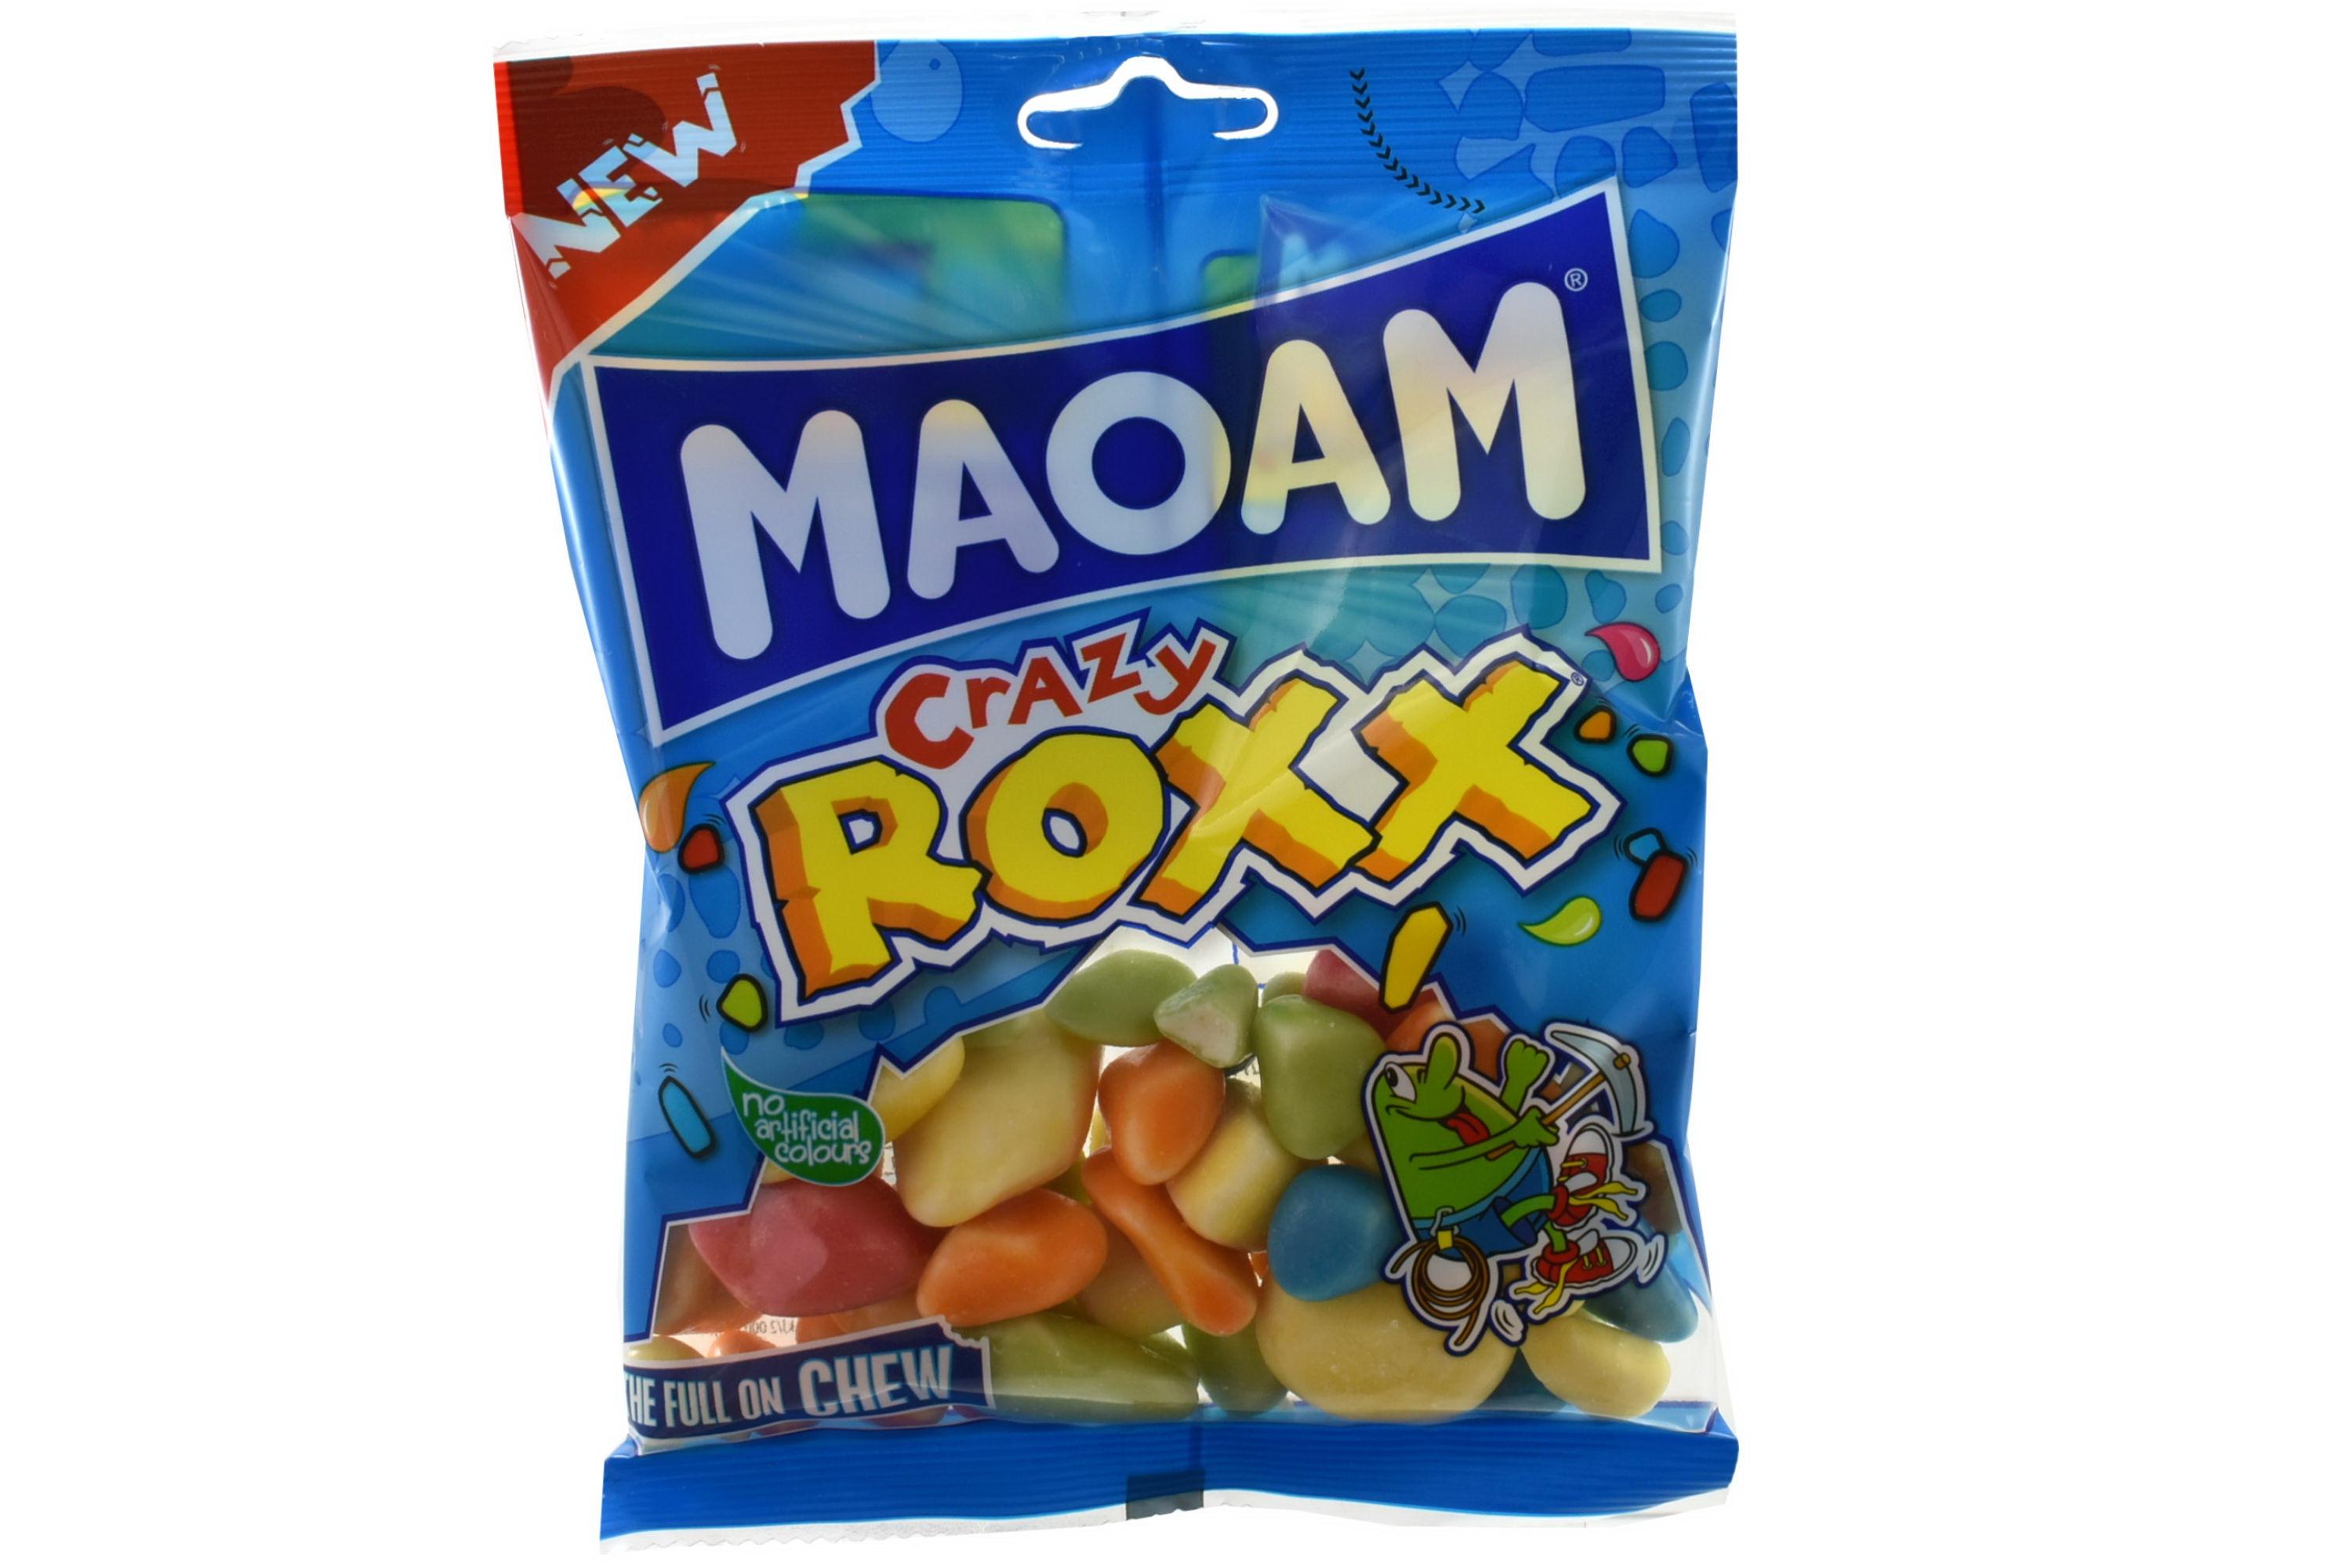 140g Maoam Crazy Roxx Prepack- Haribo